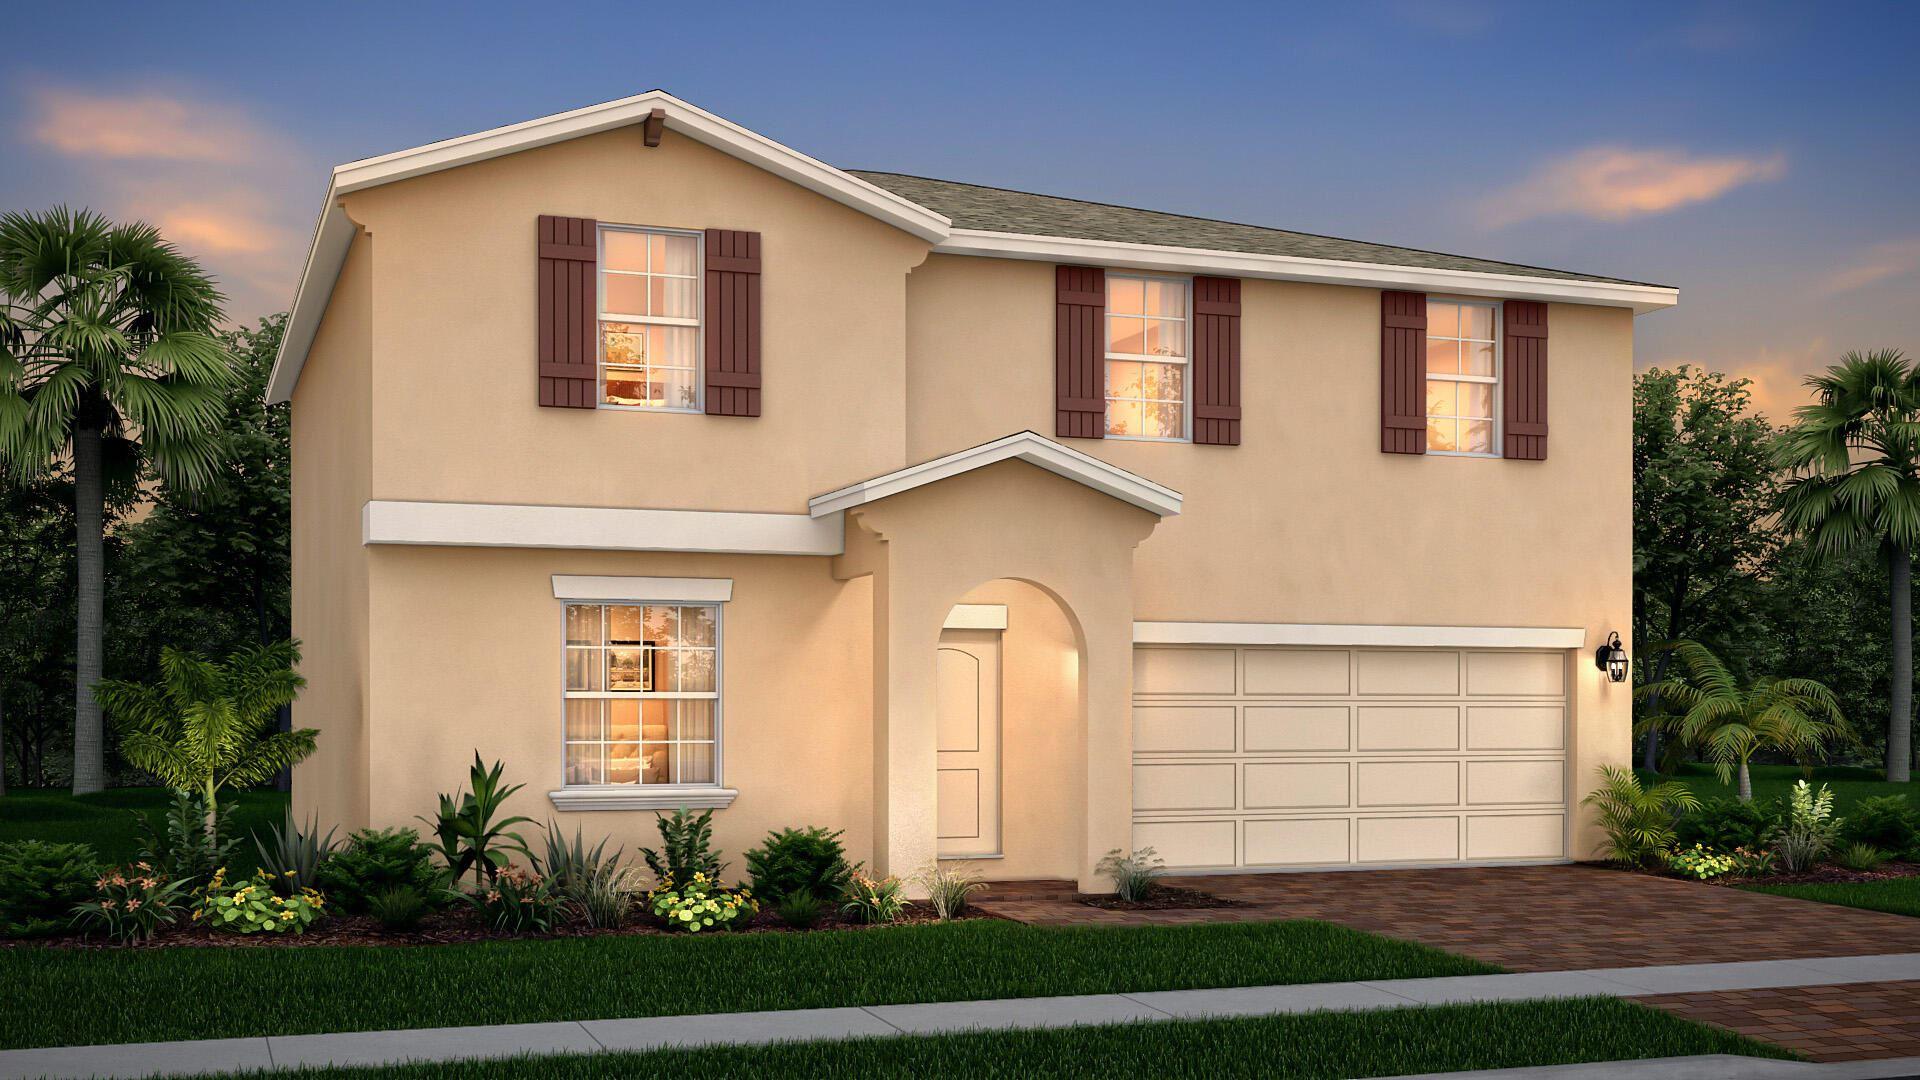 7579 NW Deysbrook Lane, Port Saint Lucie, FL 34987 - MLS#: RX-10747023